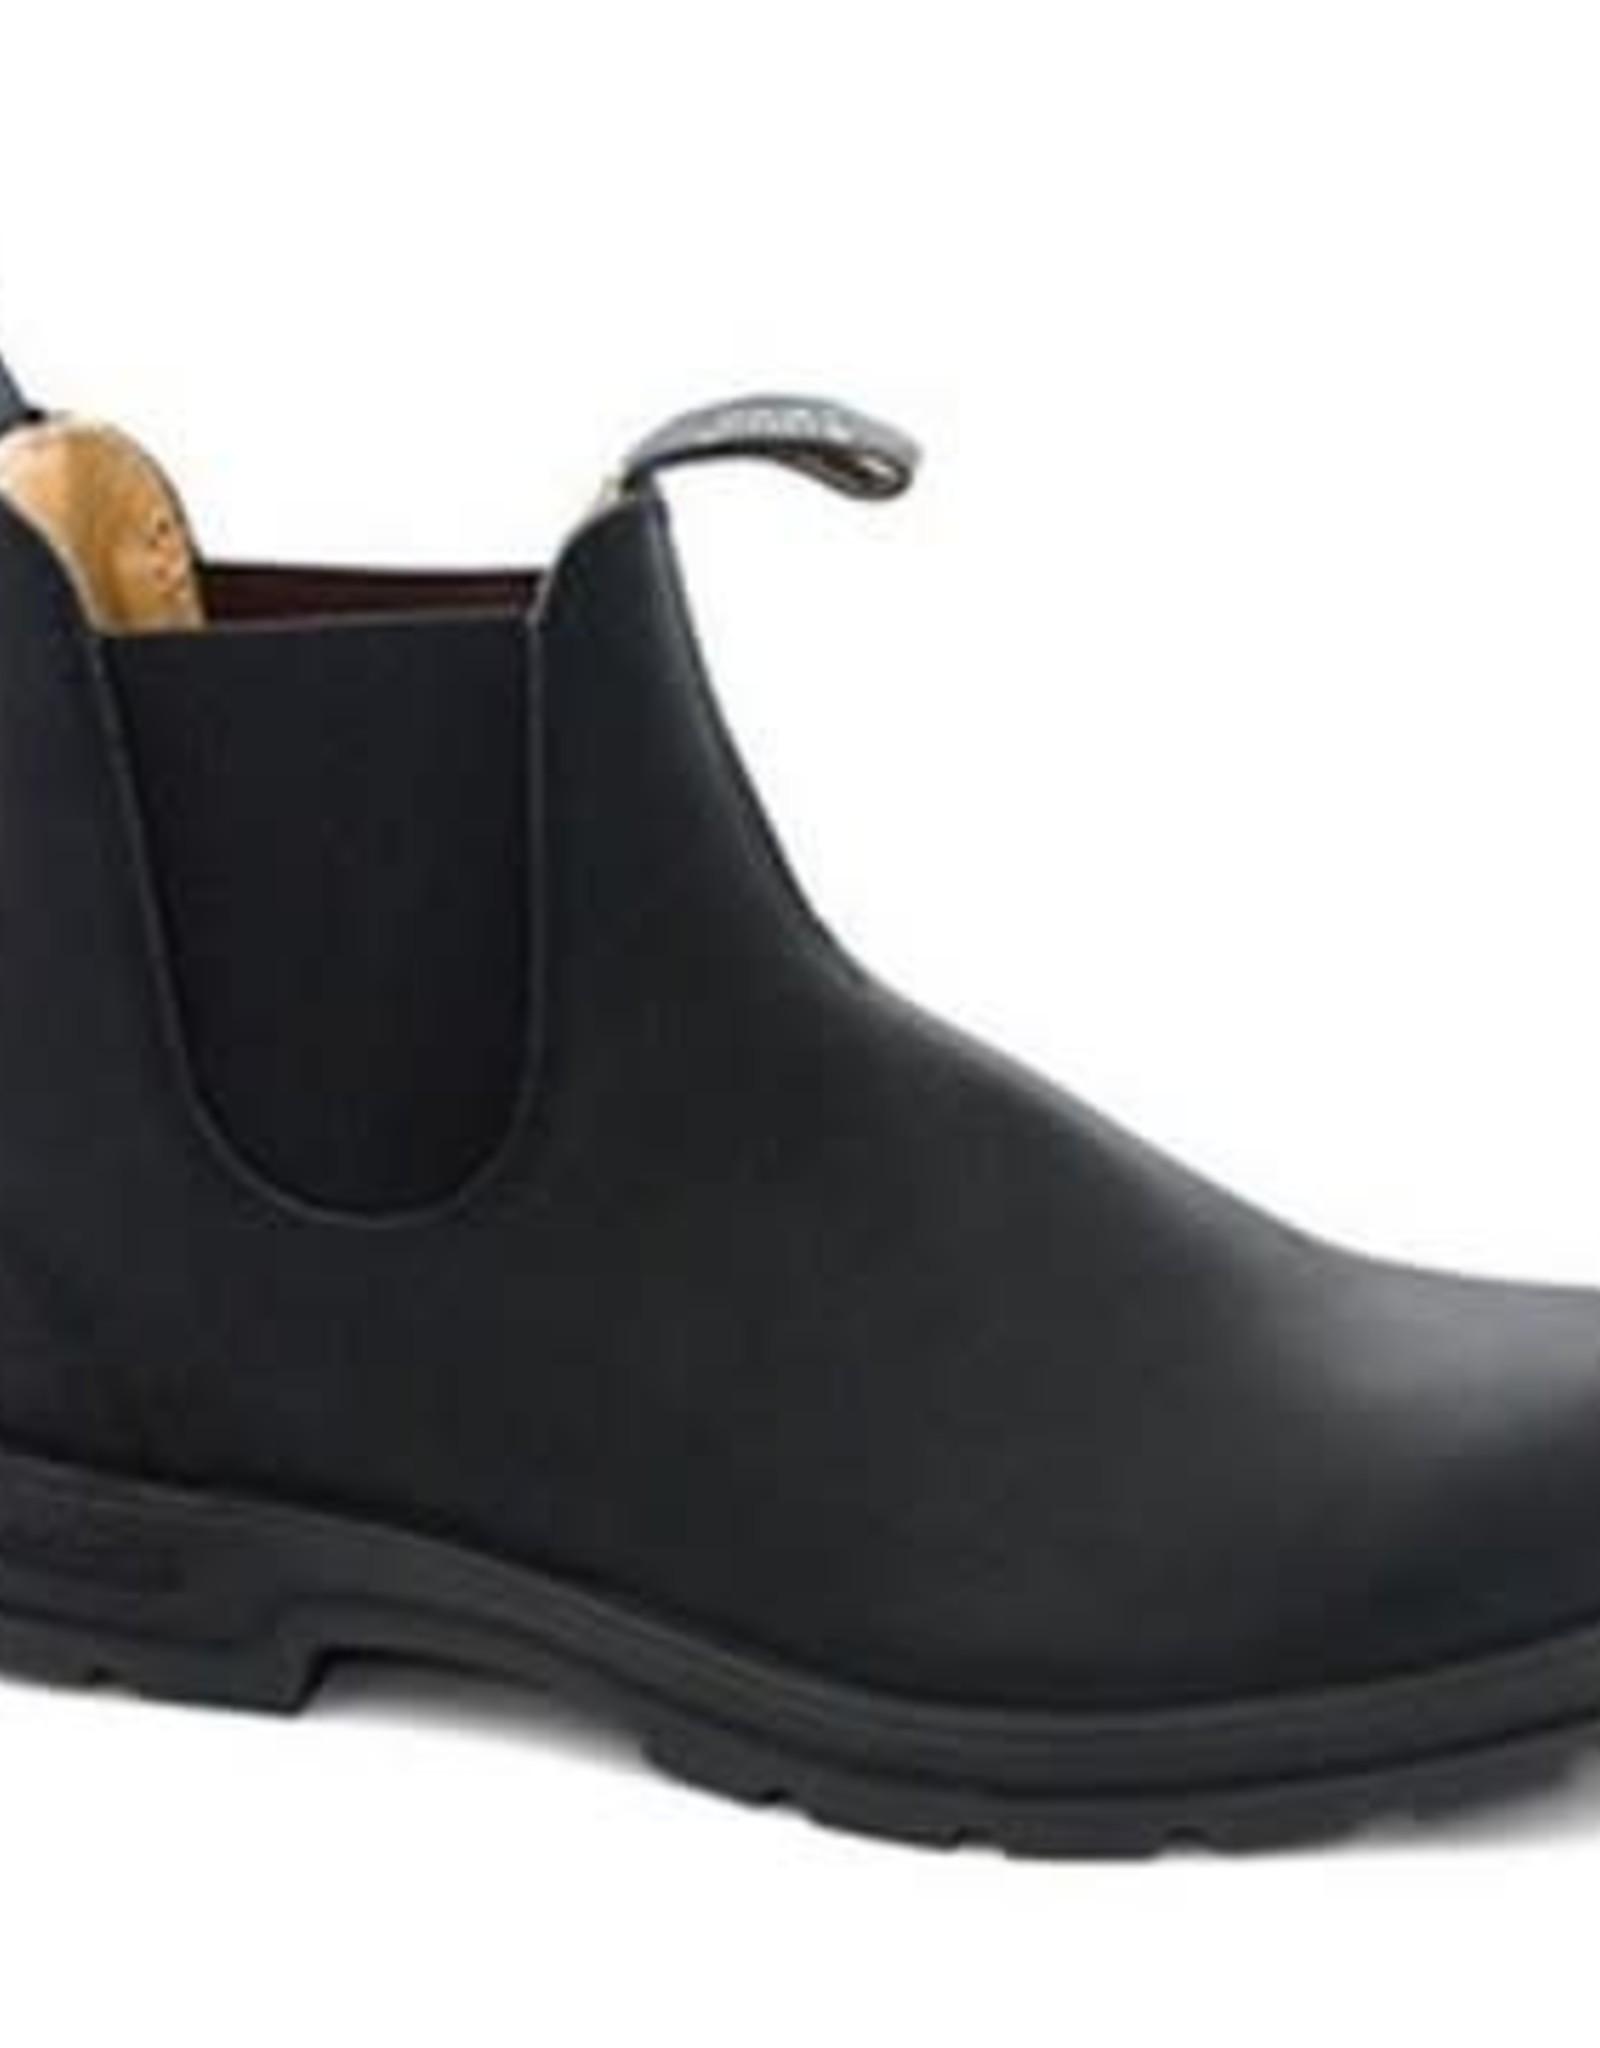 Blundstone Blundstone, 558 Leather Lined Black , 1WIDTH, 5.5